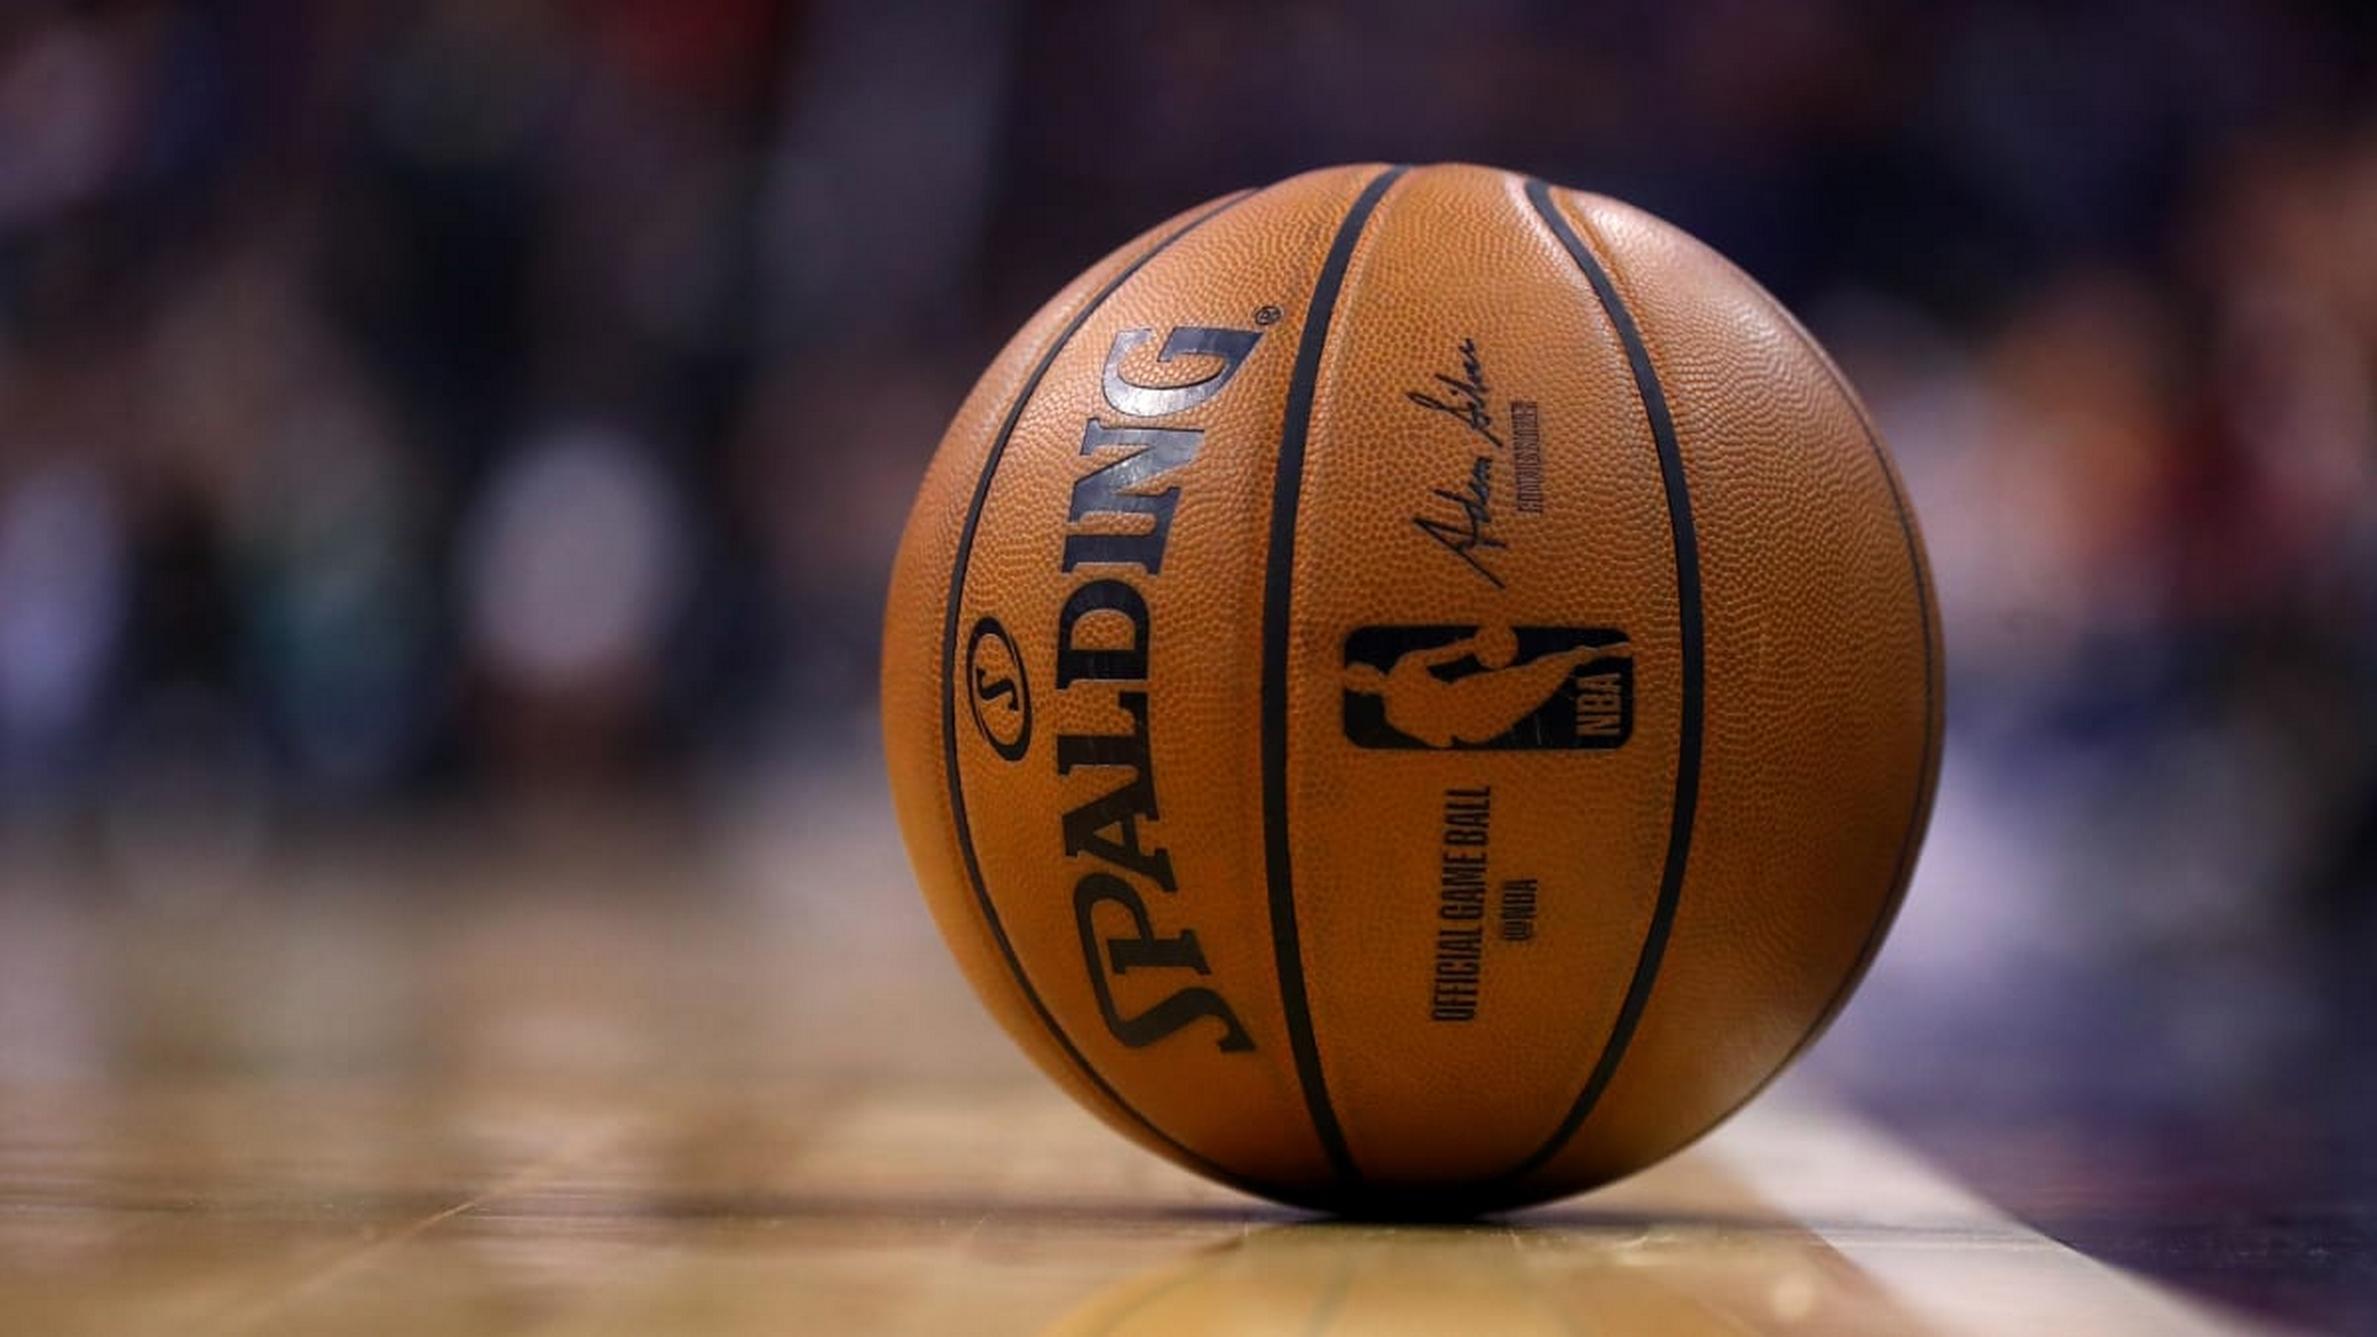 NBA: Αναβολή Νο. 15 λόγω κορονοϊού – Δεν διεξάγεται το Μπλέιζερς – Γκρίζλις